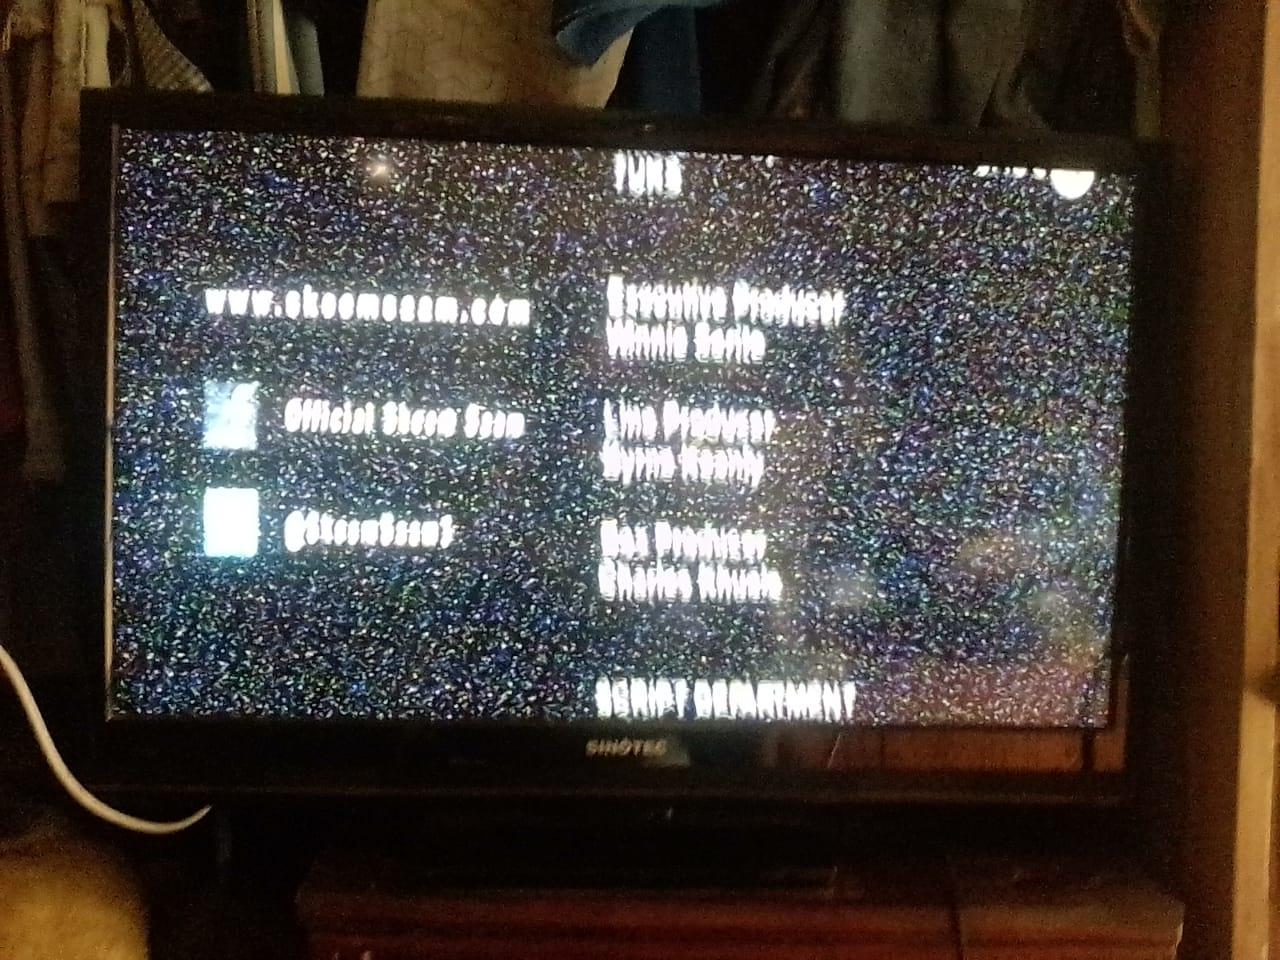 Sinotec Tv